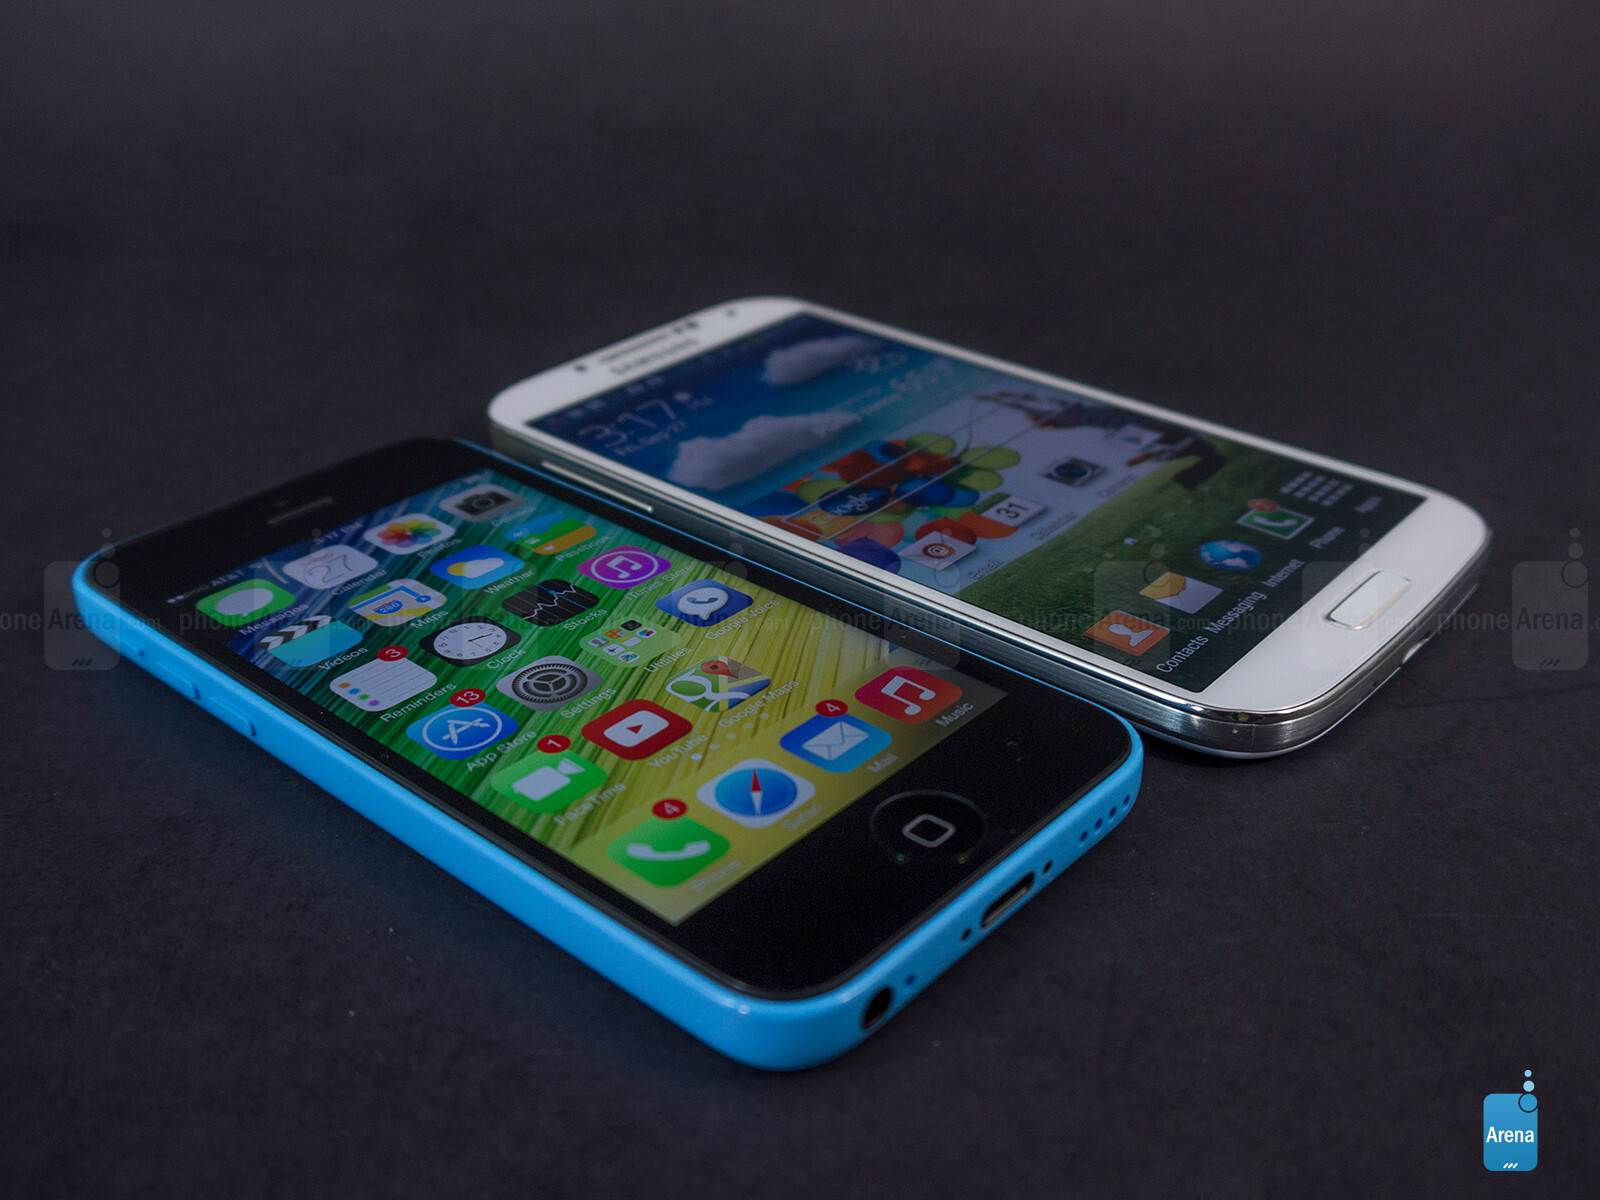 Iphone 5c vs galaxy s3